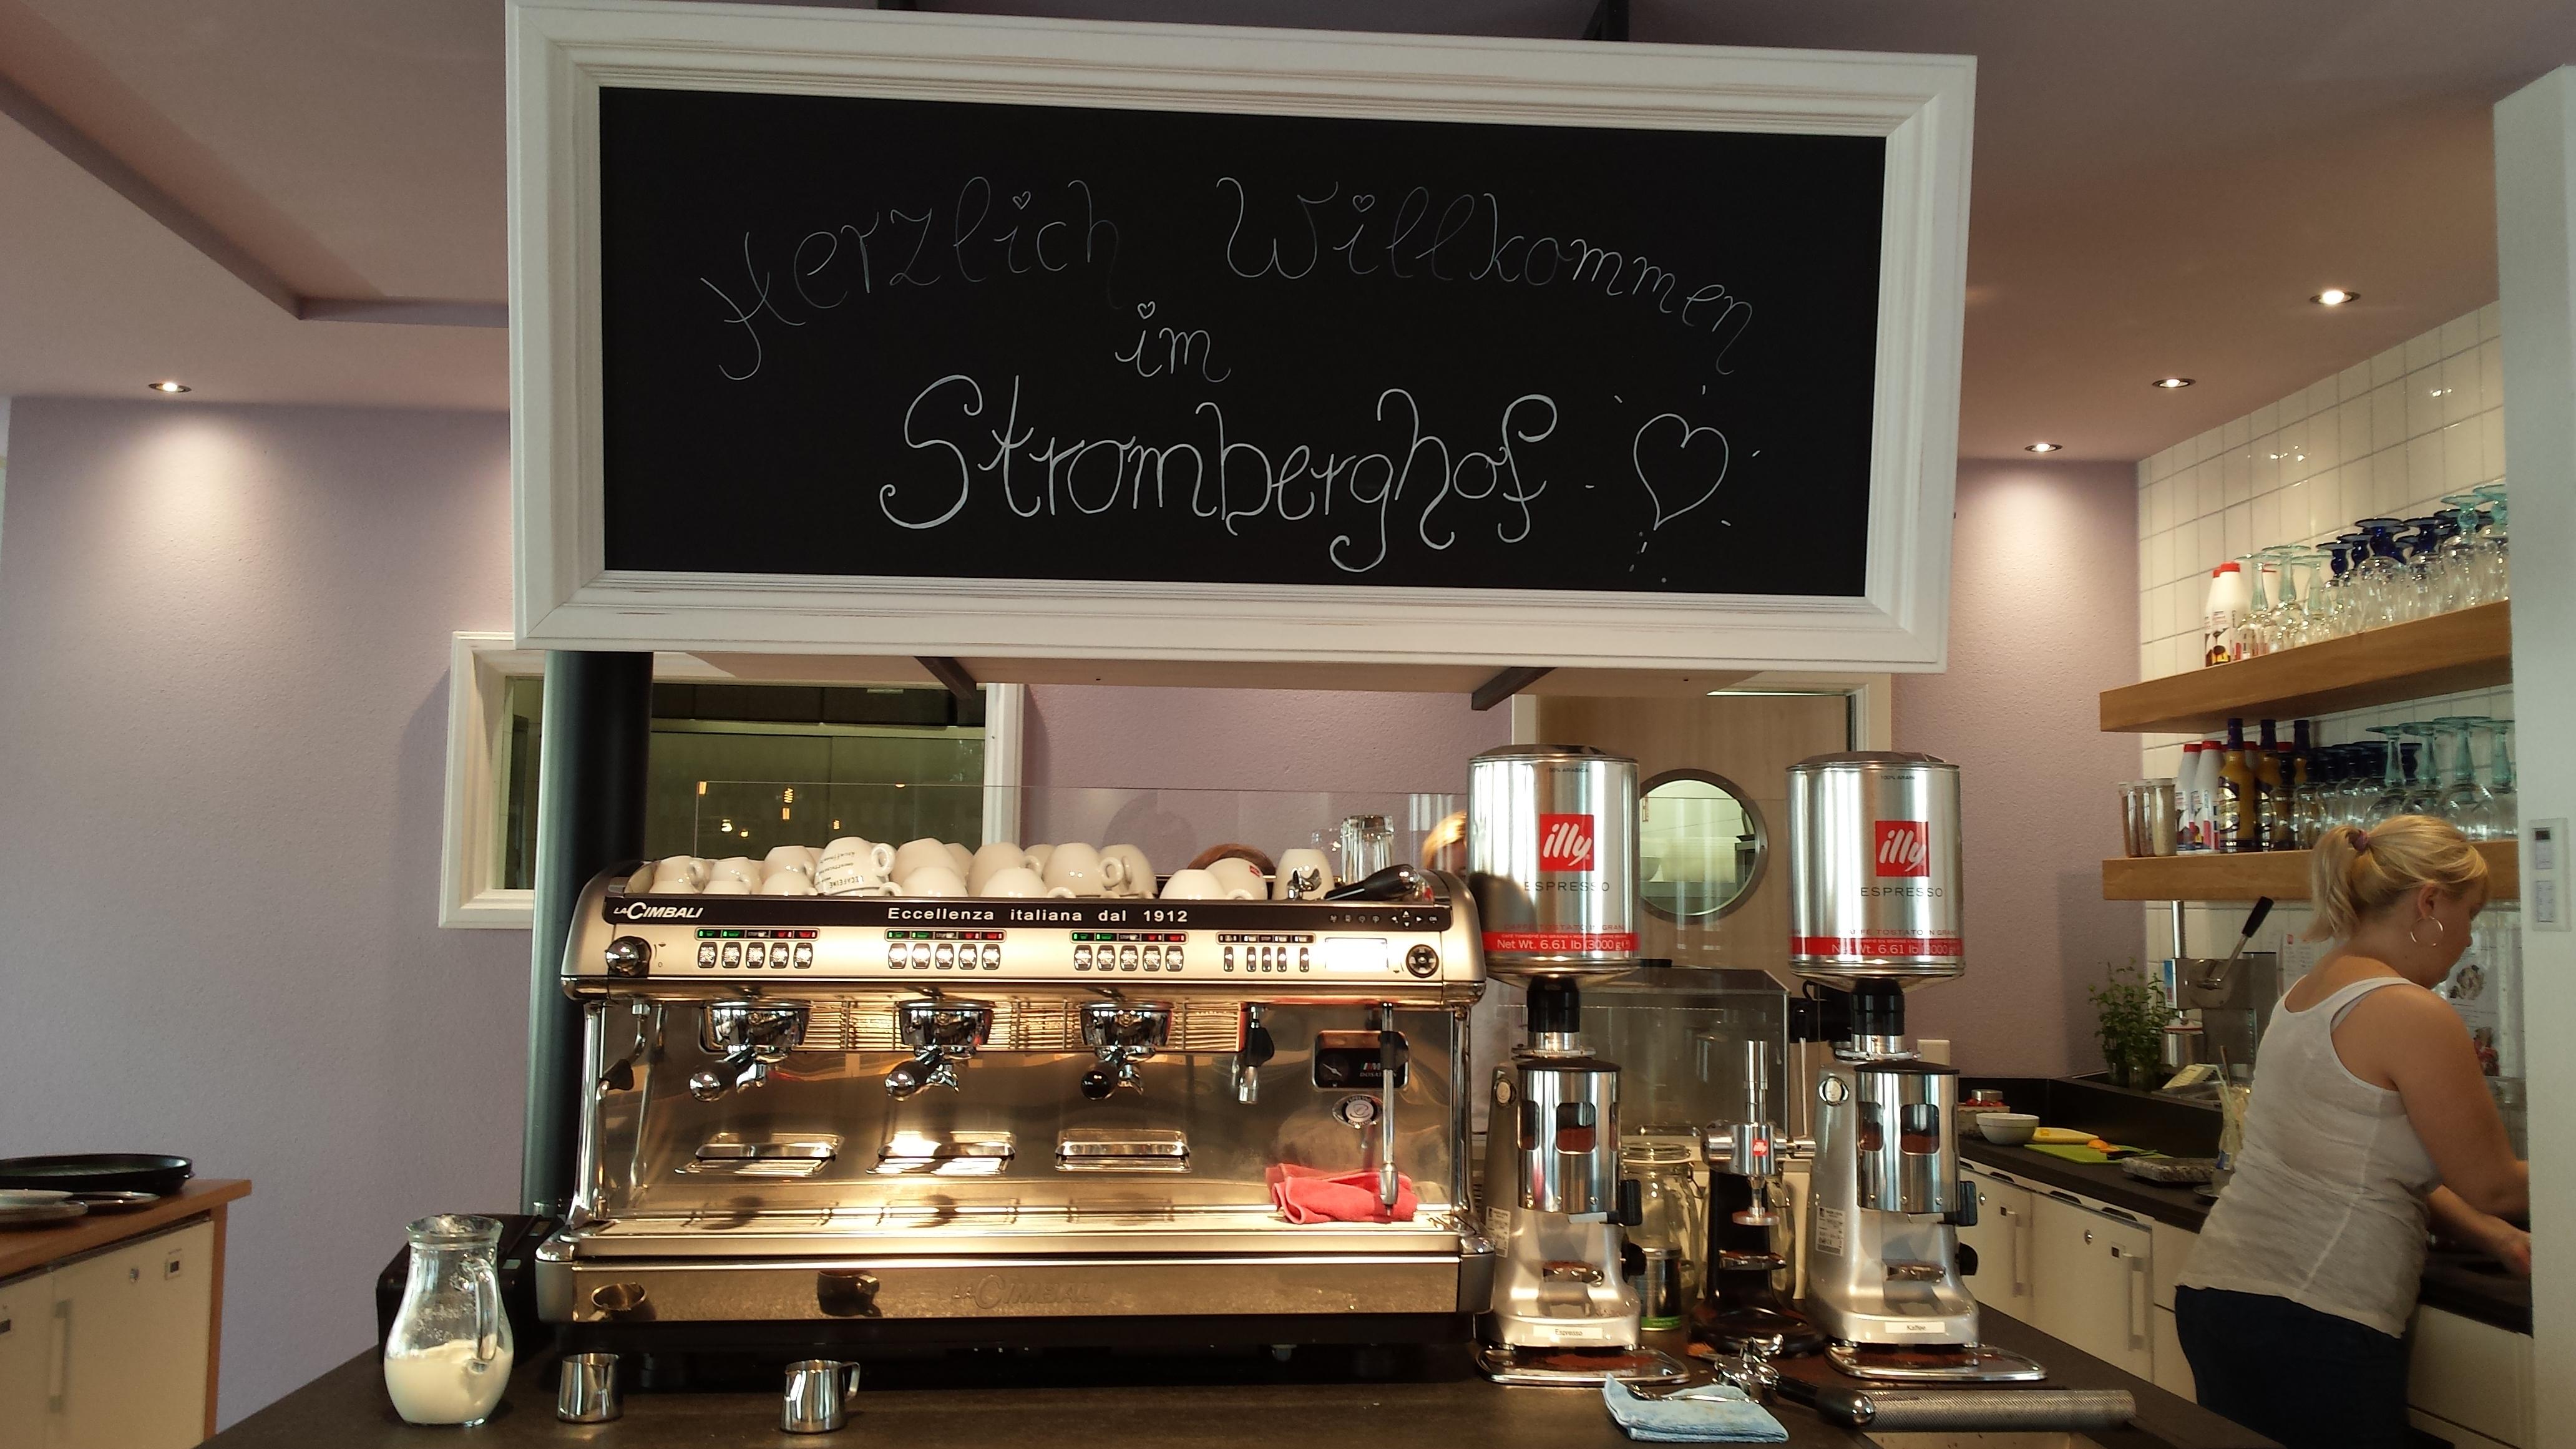 Landcafé Leinberger